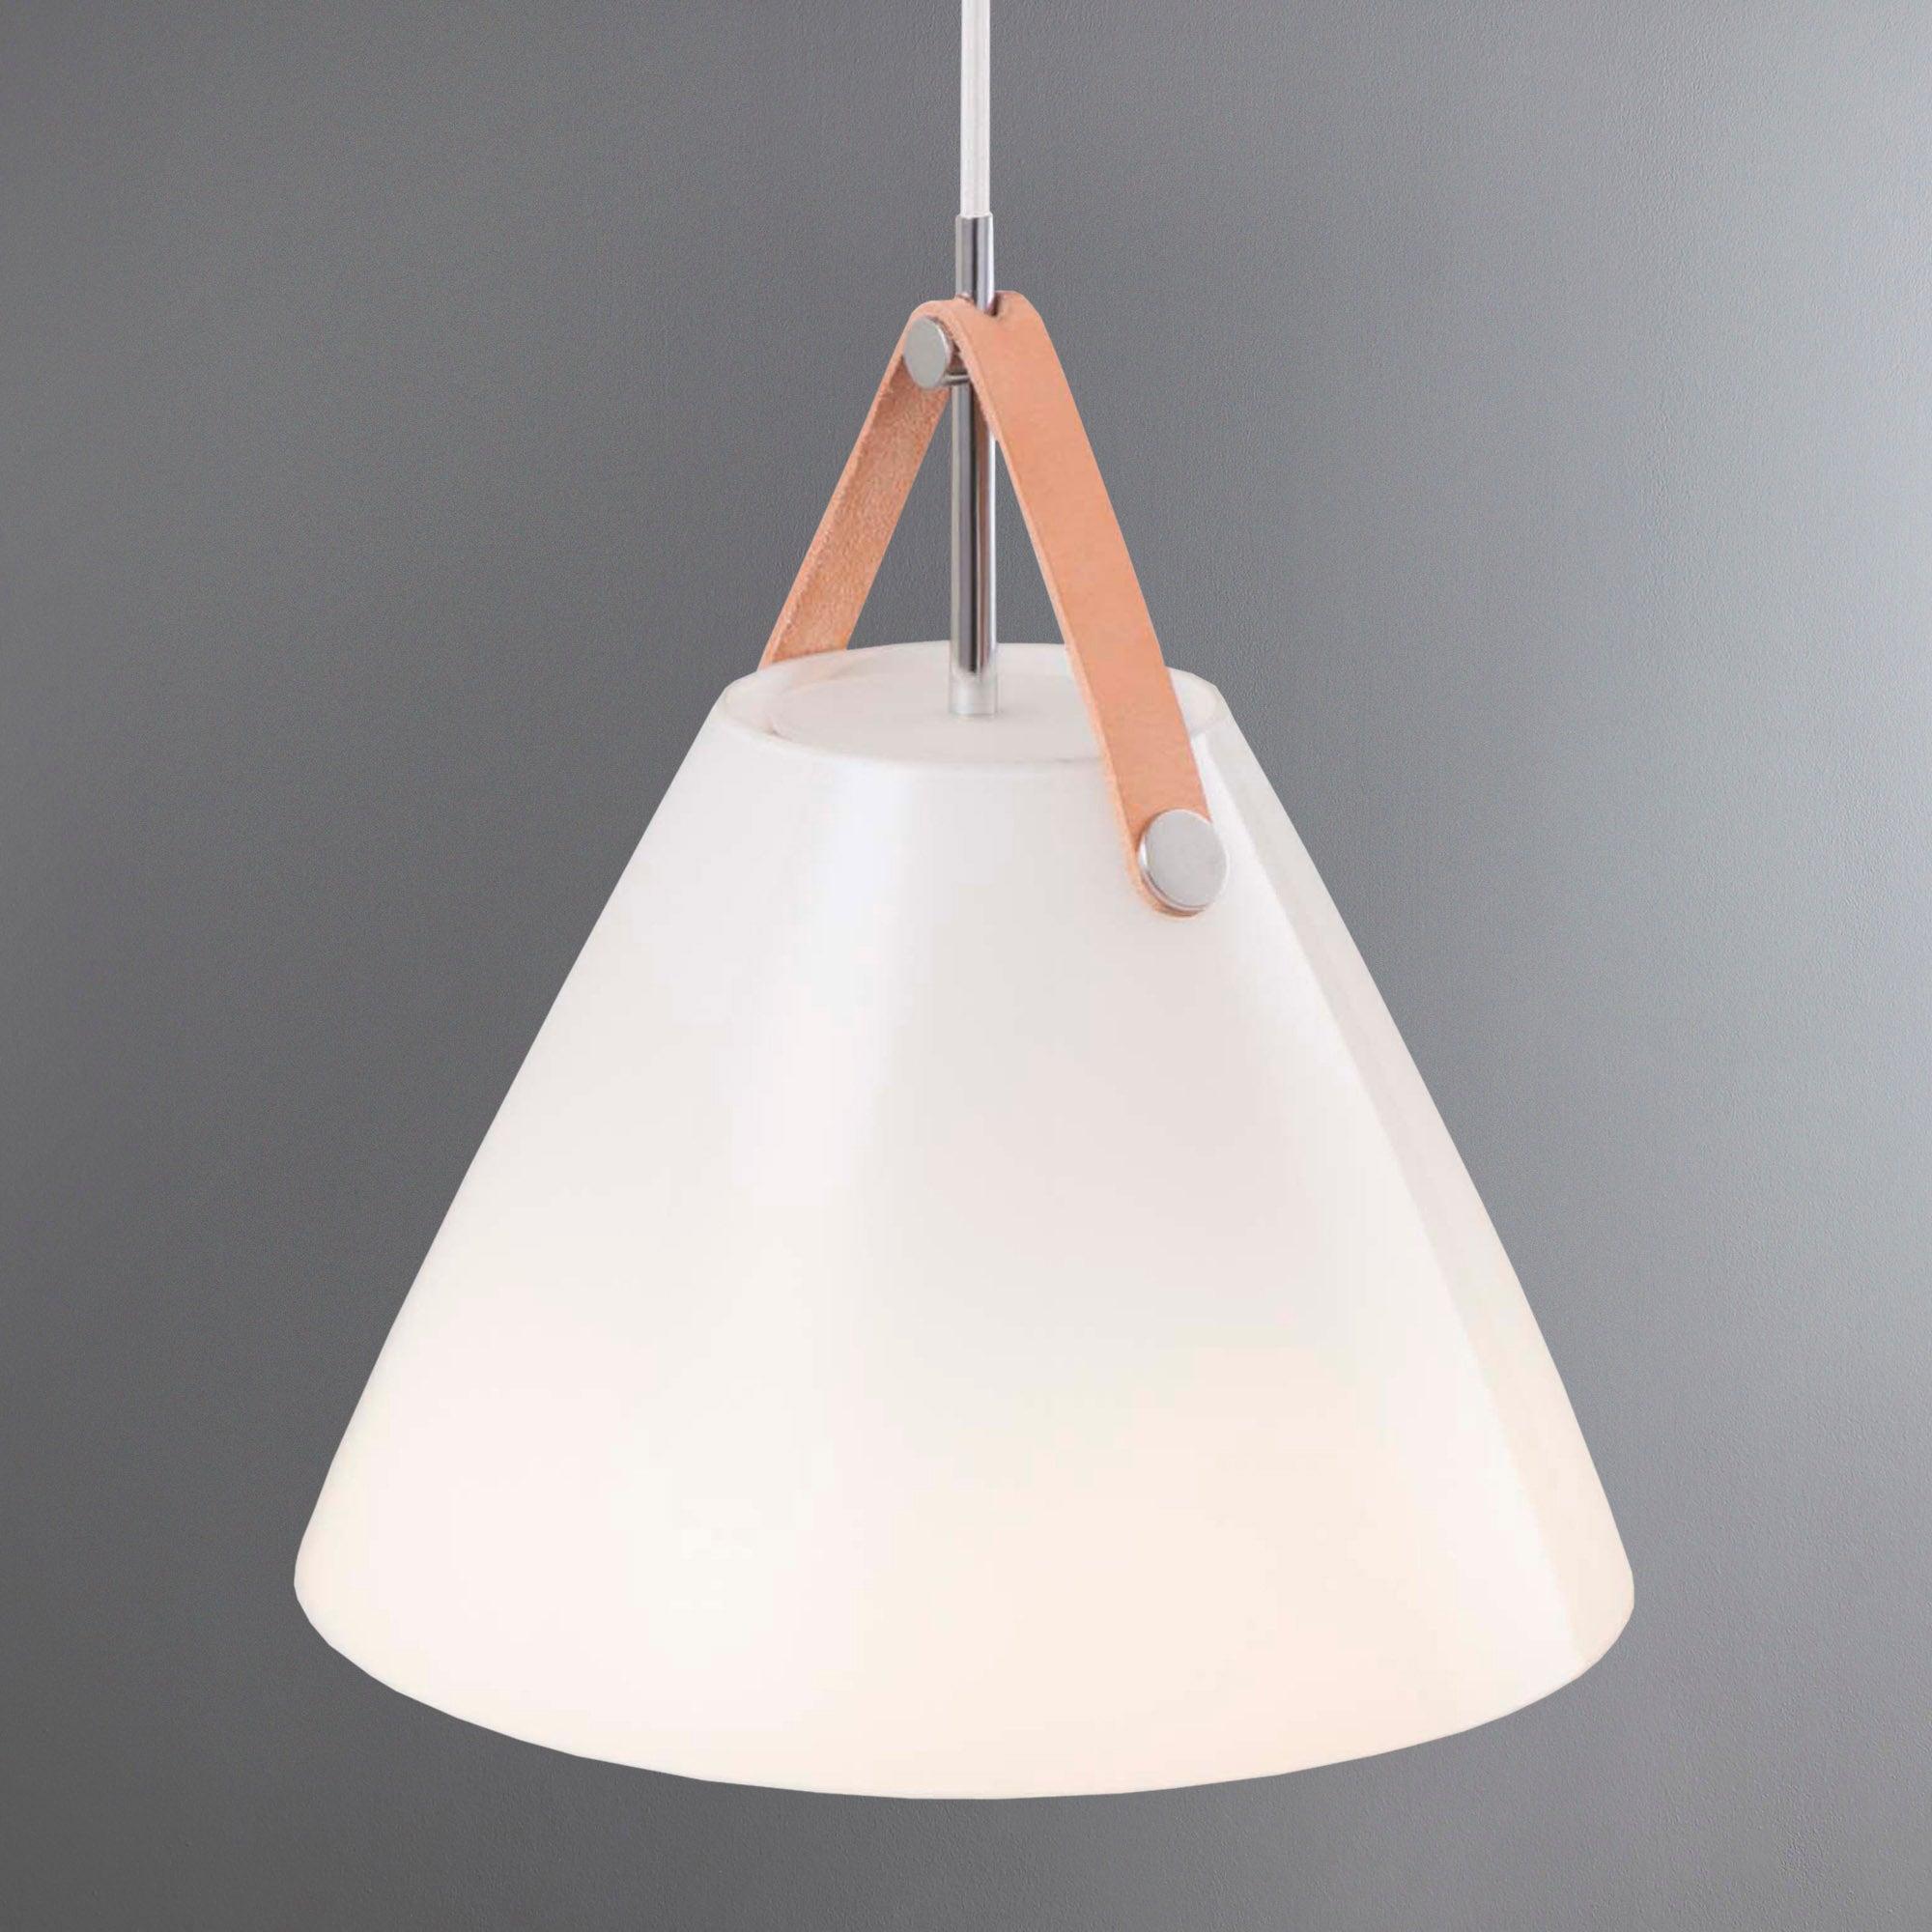 Photo of Strap small white glass pendant light fitting white